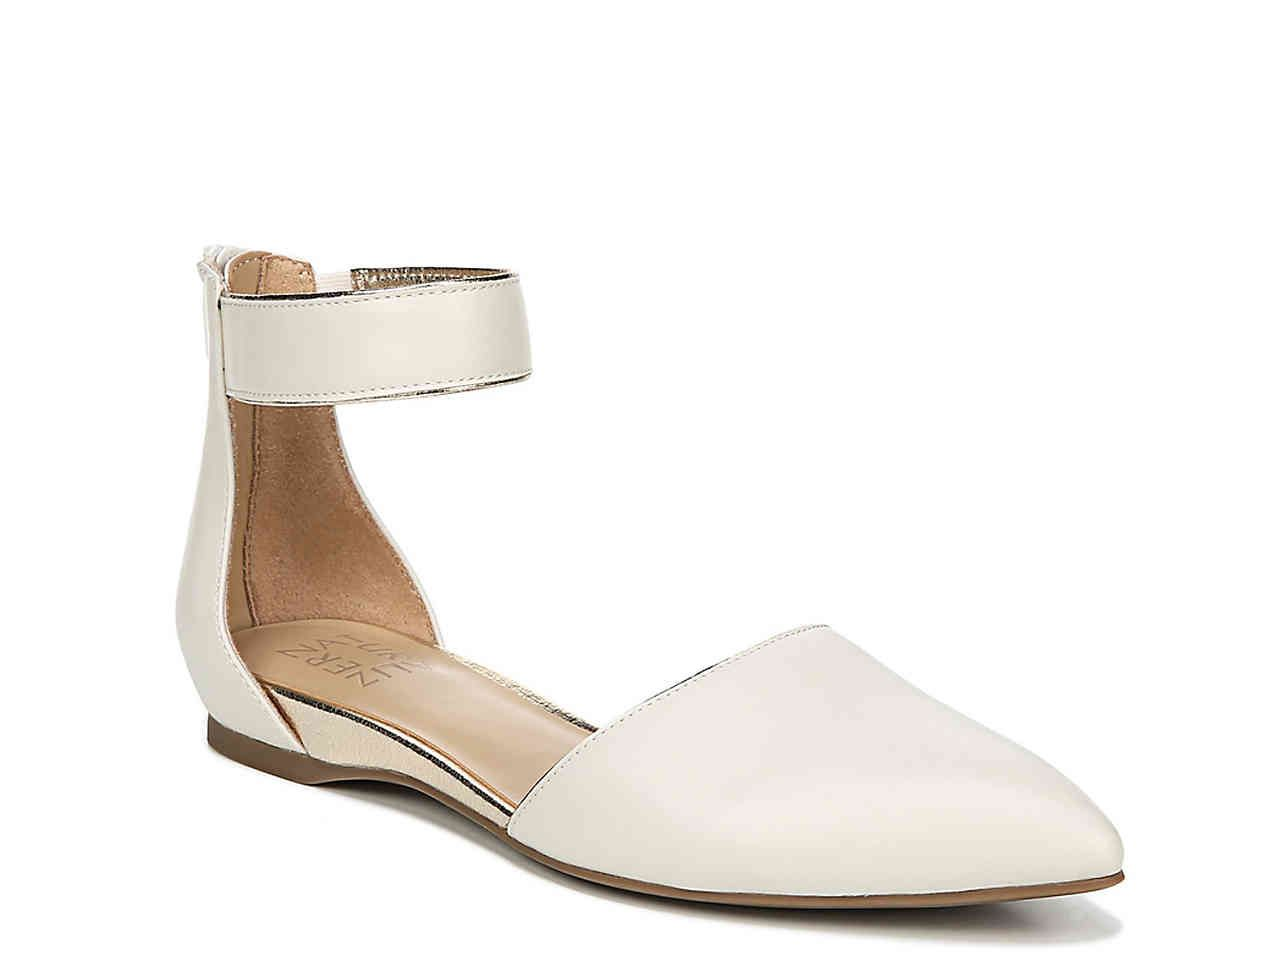 flats, Wedding shoes flats, Peep toe flats